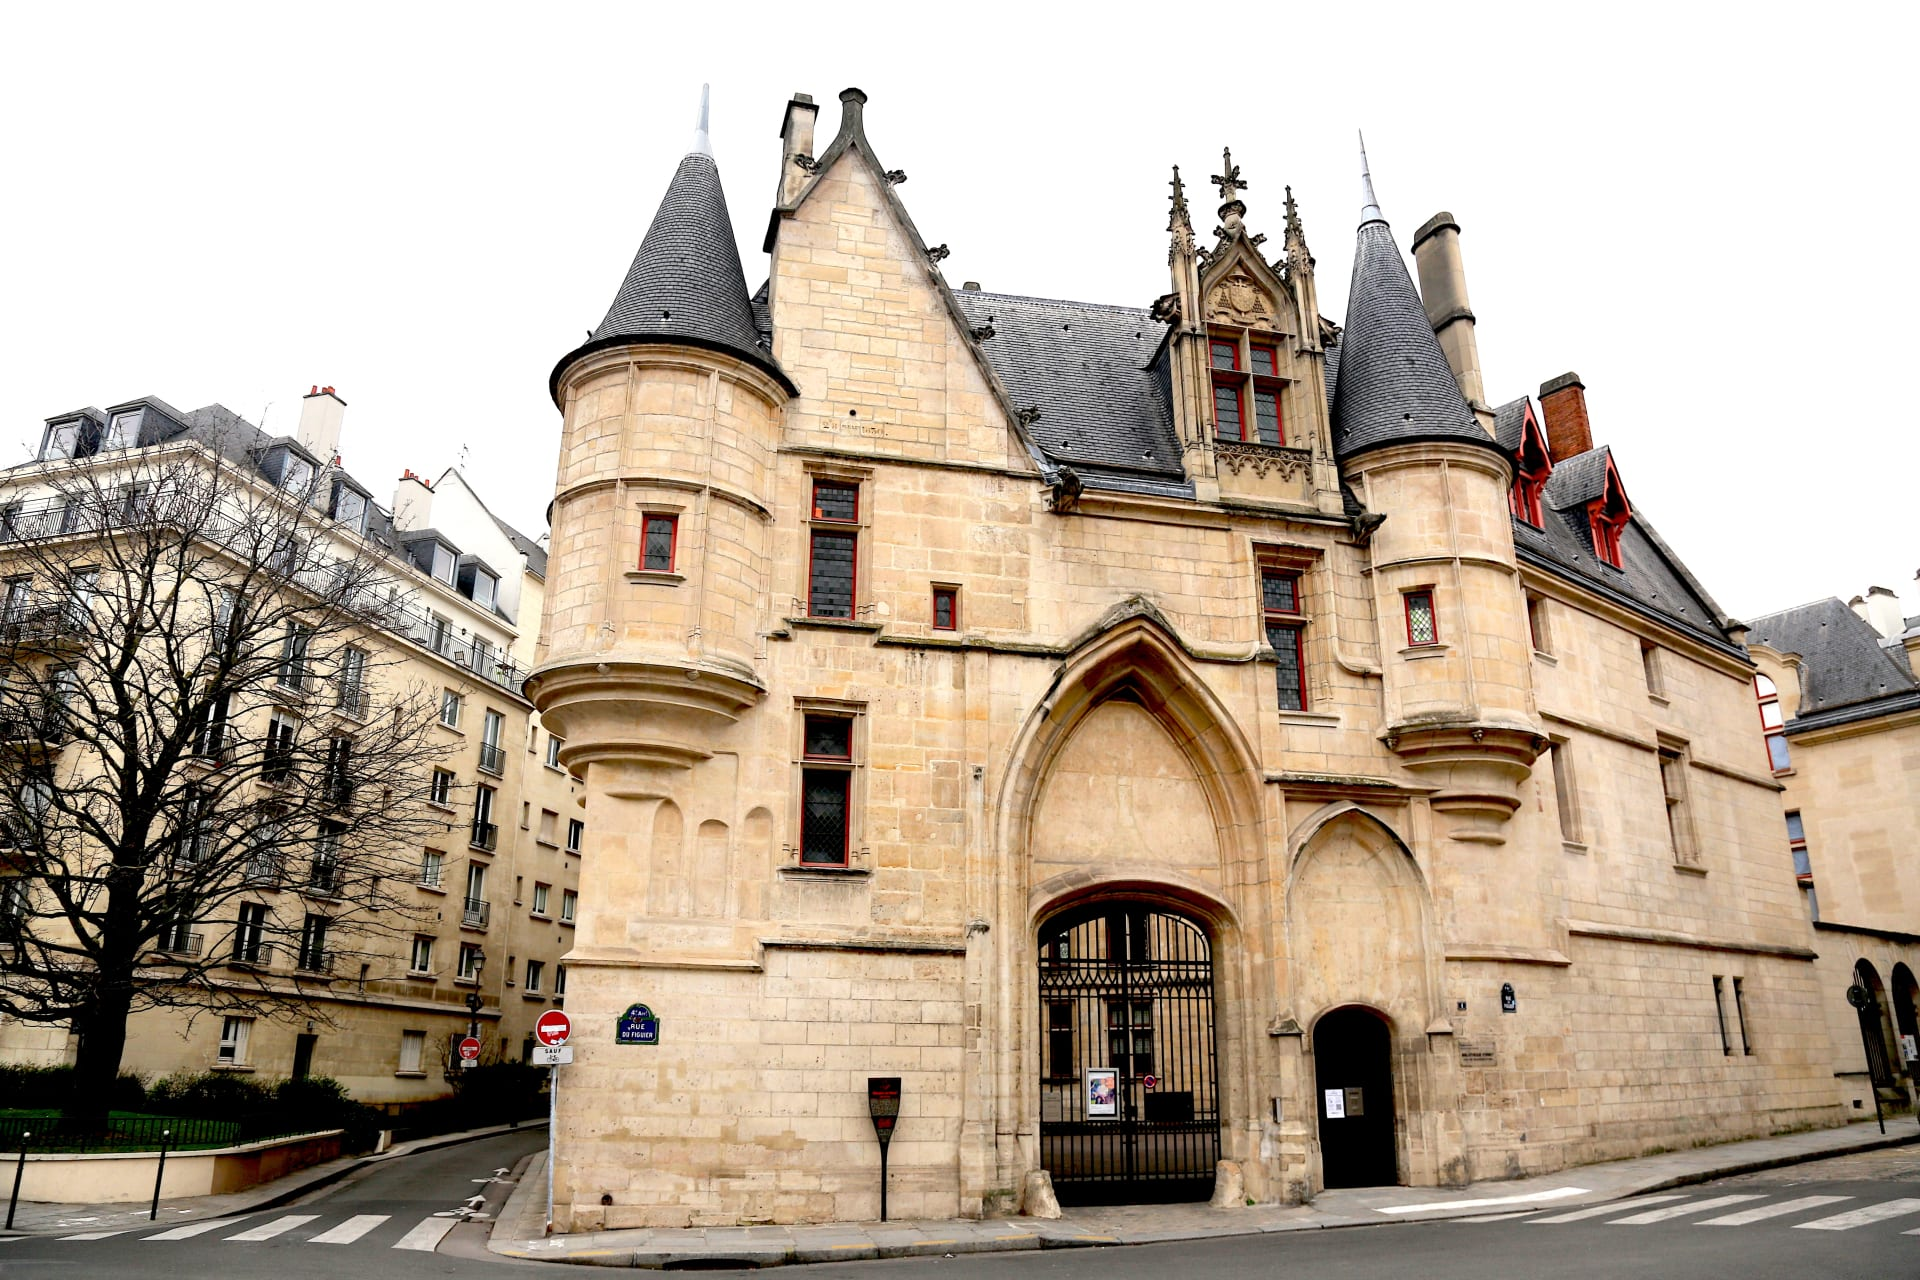 Paris - Evolution of the Parisian Architecture